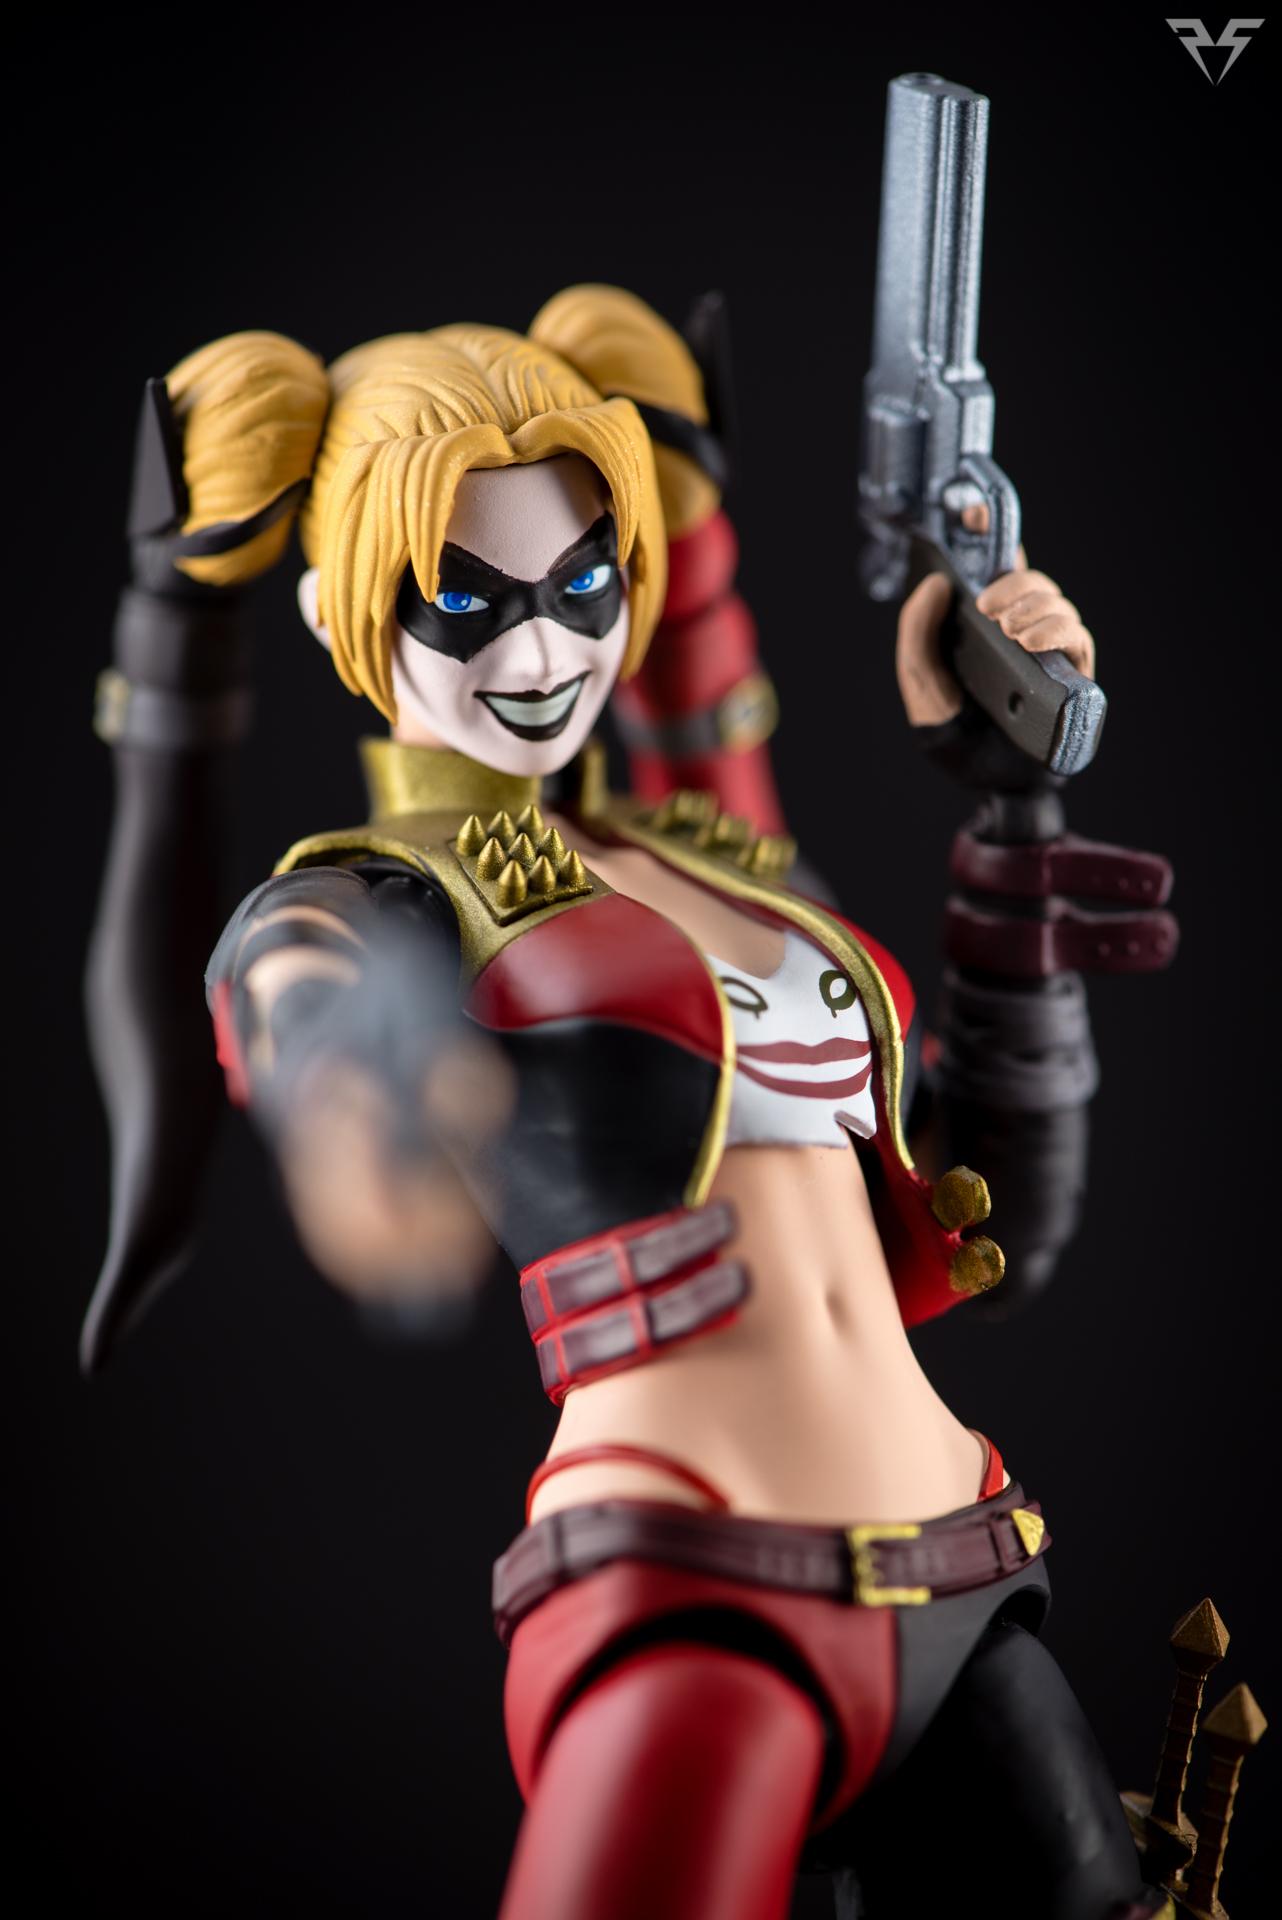 Figuarts Harley Quinn-28.jpg